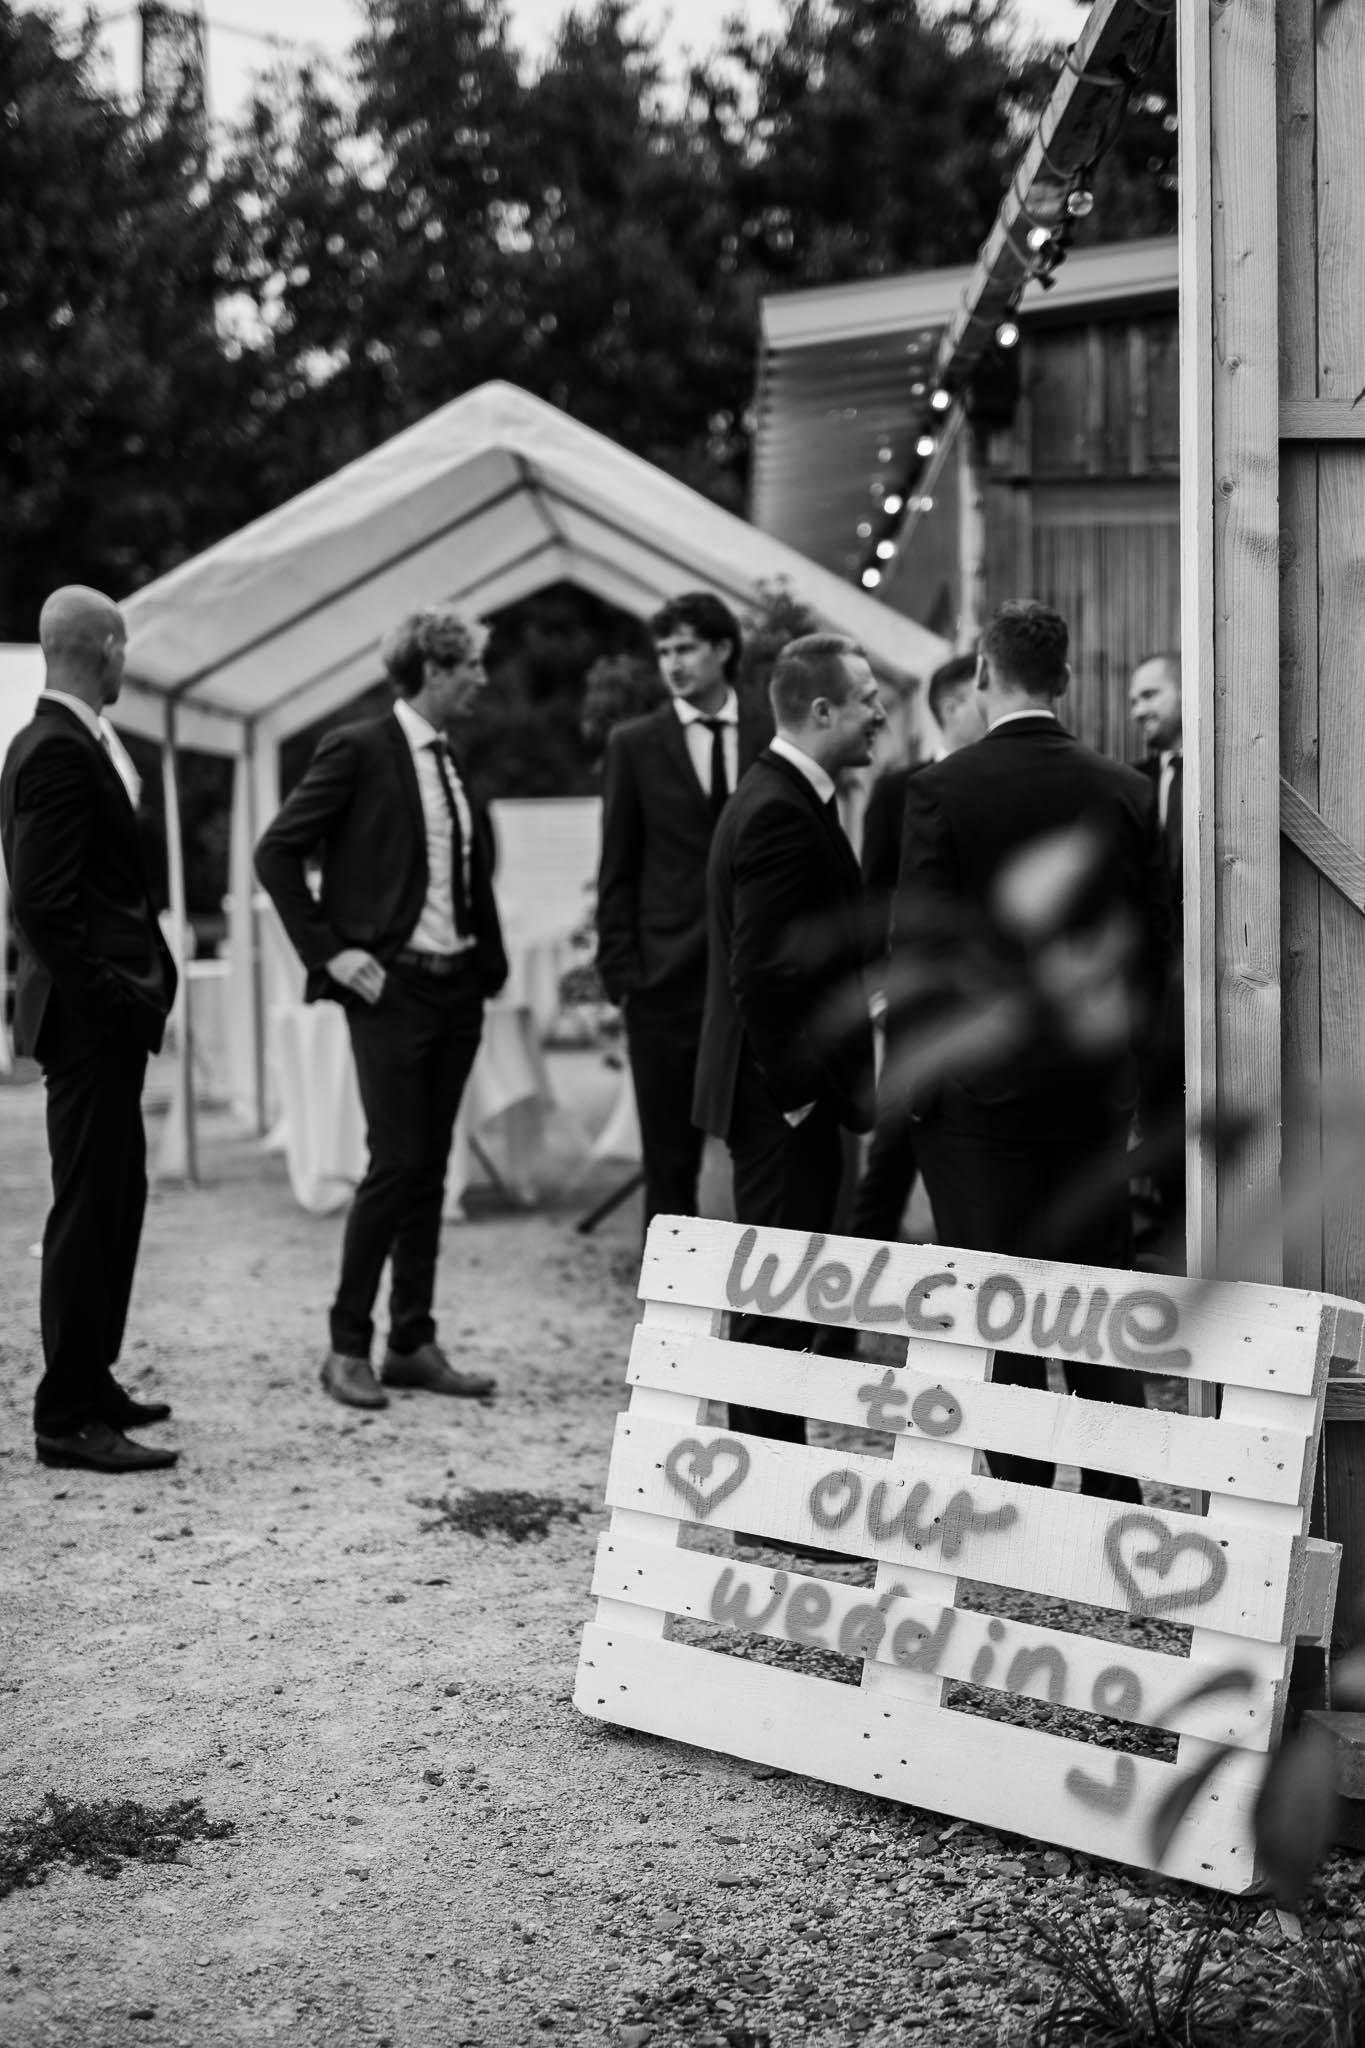 Hochzeitsfotograf Limburg an der Lahn 5